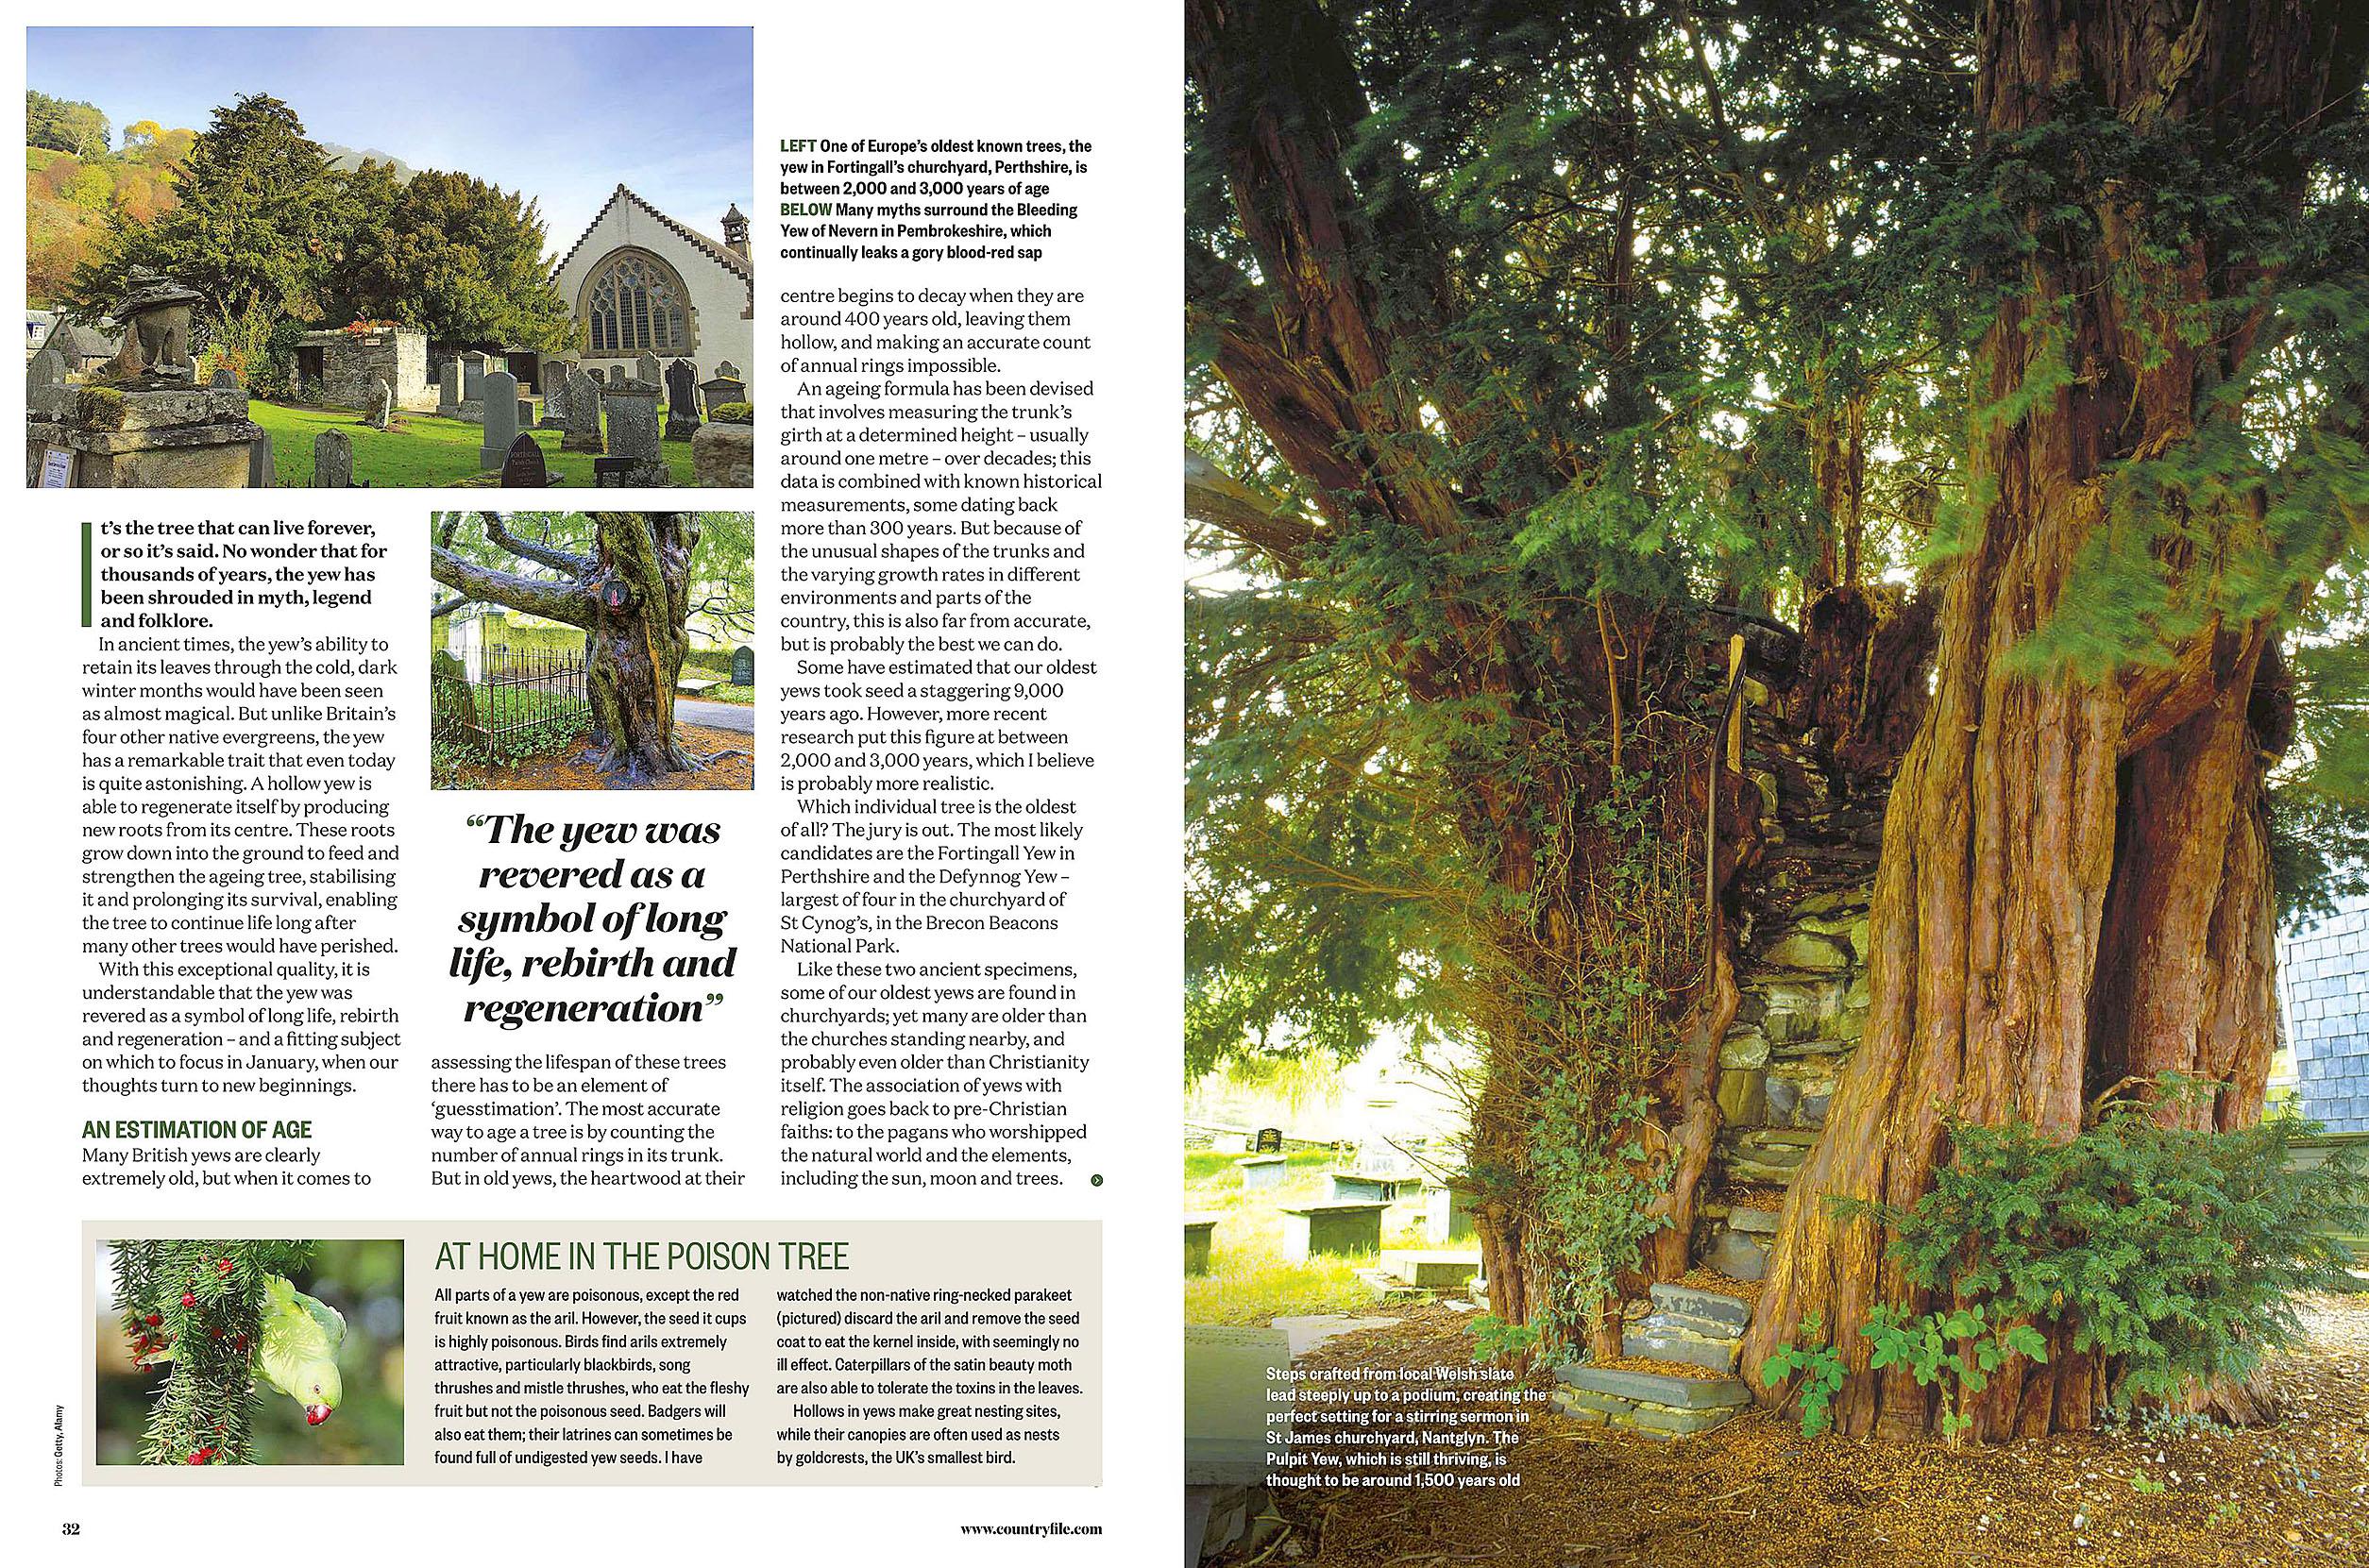 BBC Countryfile 2020-01 Trees 02.jpg